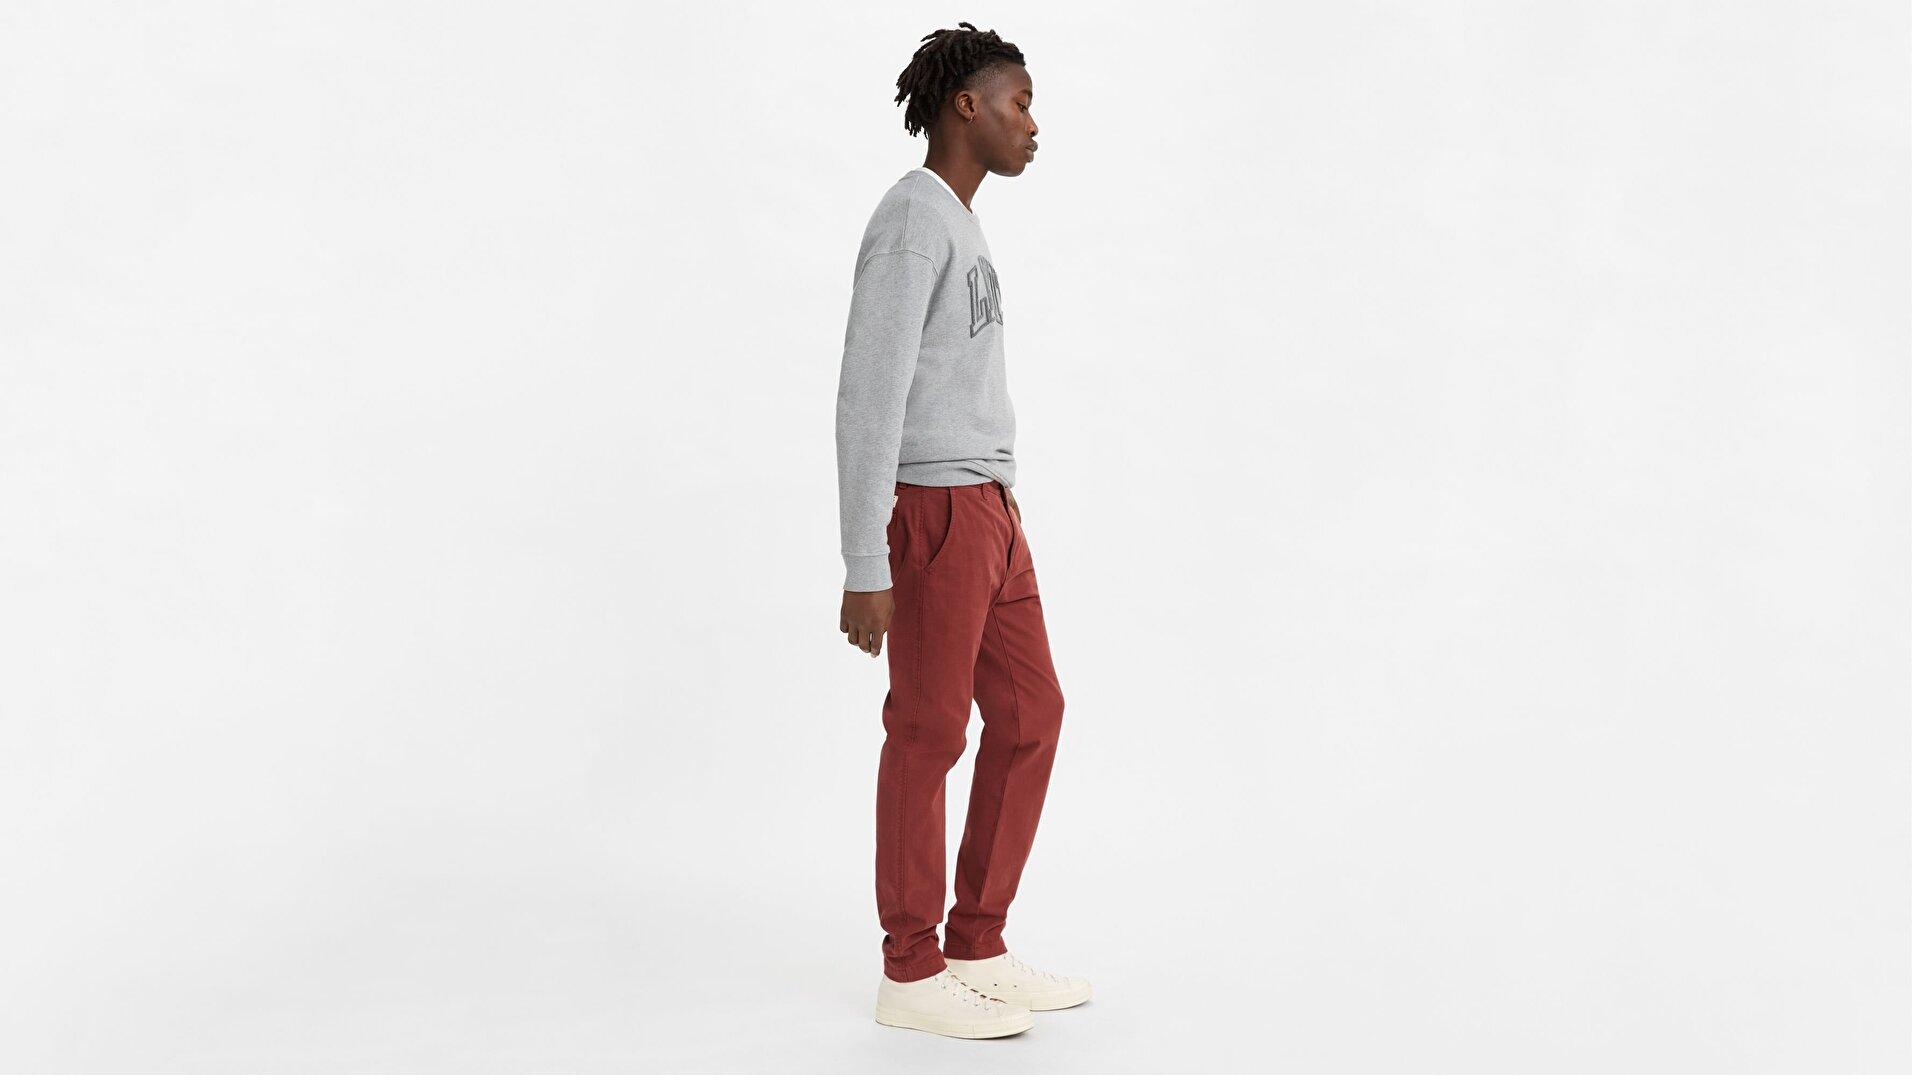 XX Chino Slim Fit Erkek Pantolon-Madder Brown Str Twill Gd